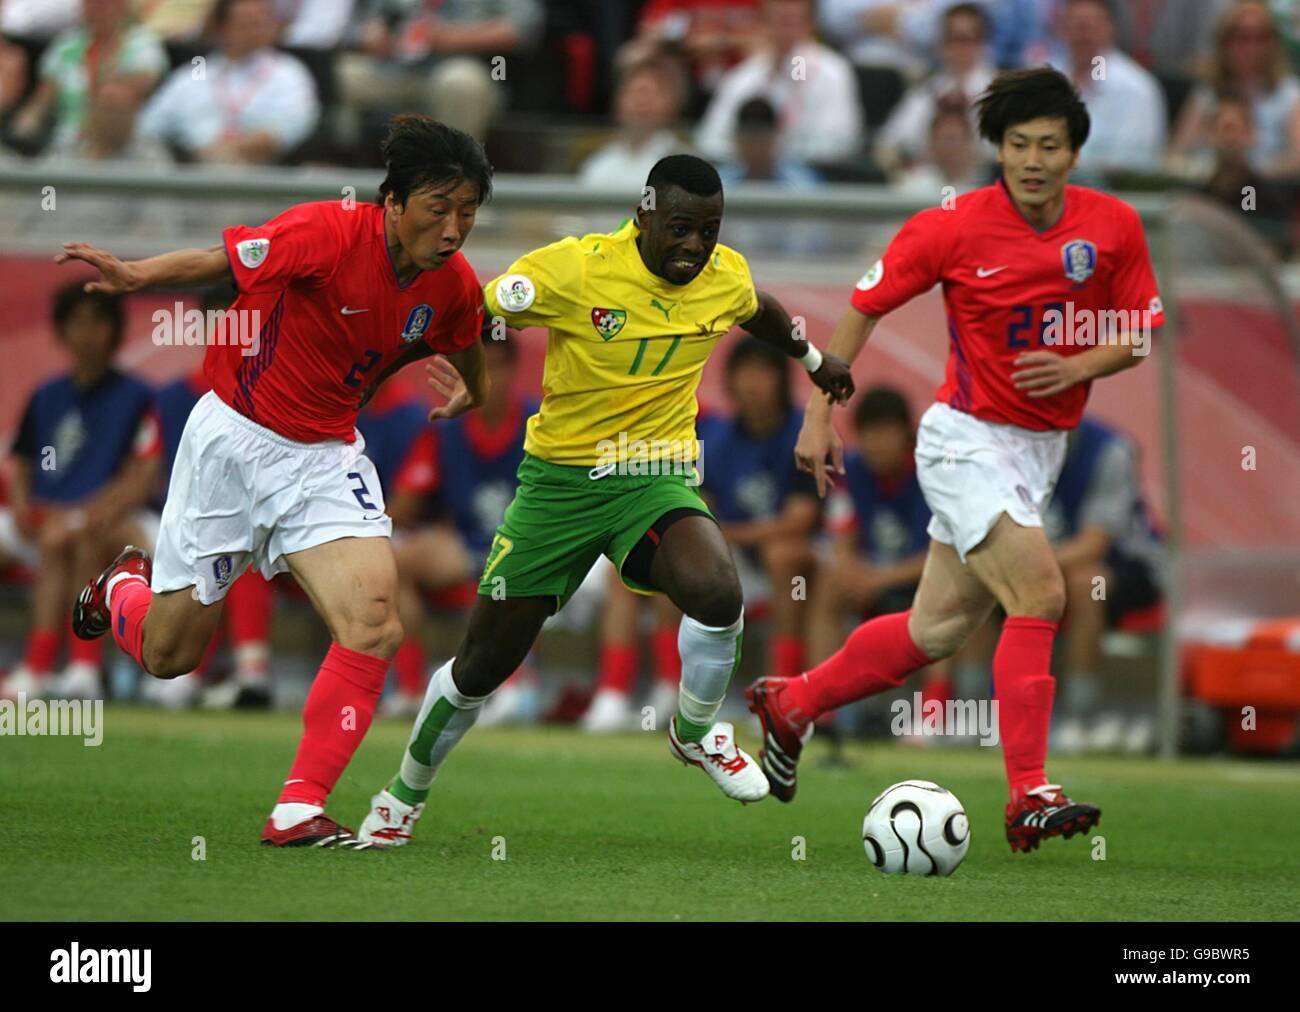 Football coupe du monde de la fifa 2006 groupe g cor e du sud v togo commerzbank arena - Coupe du monde de football 2006 ...